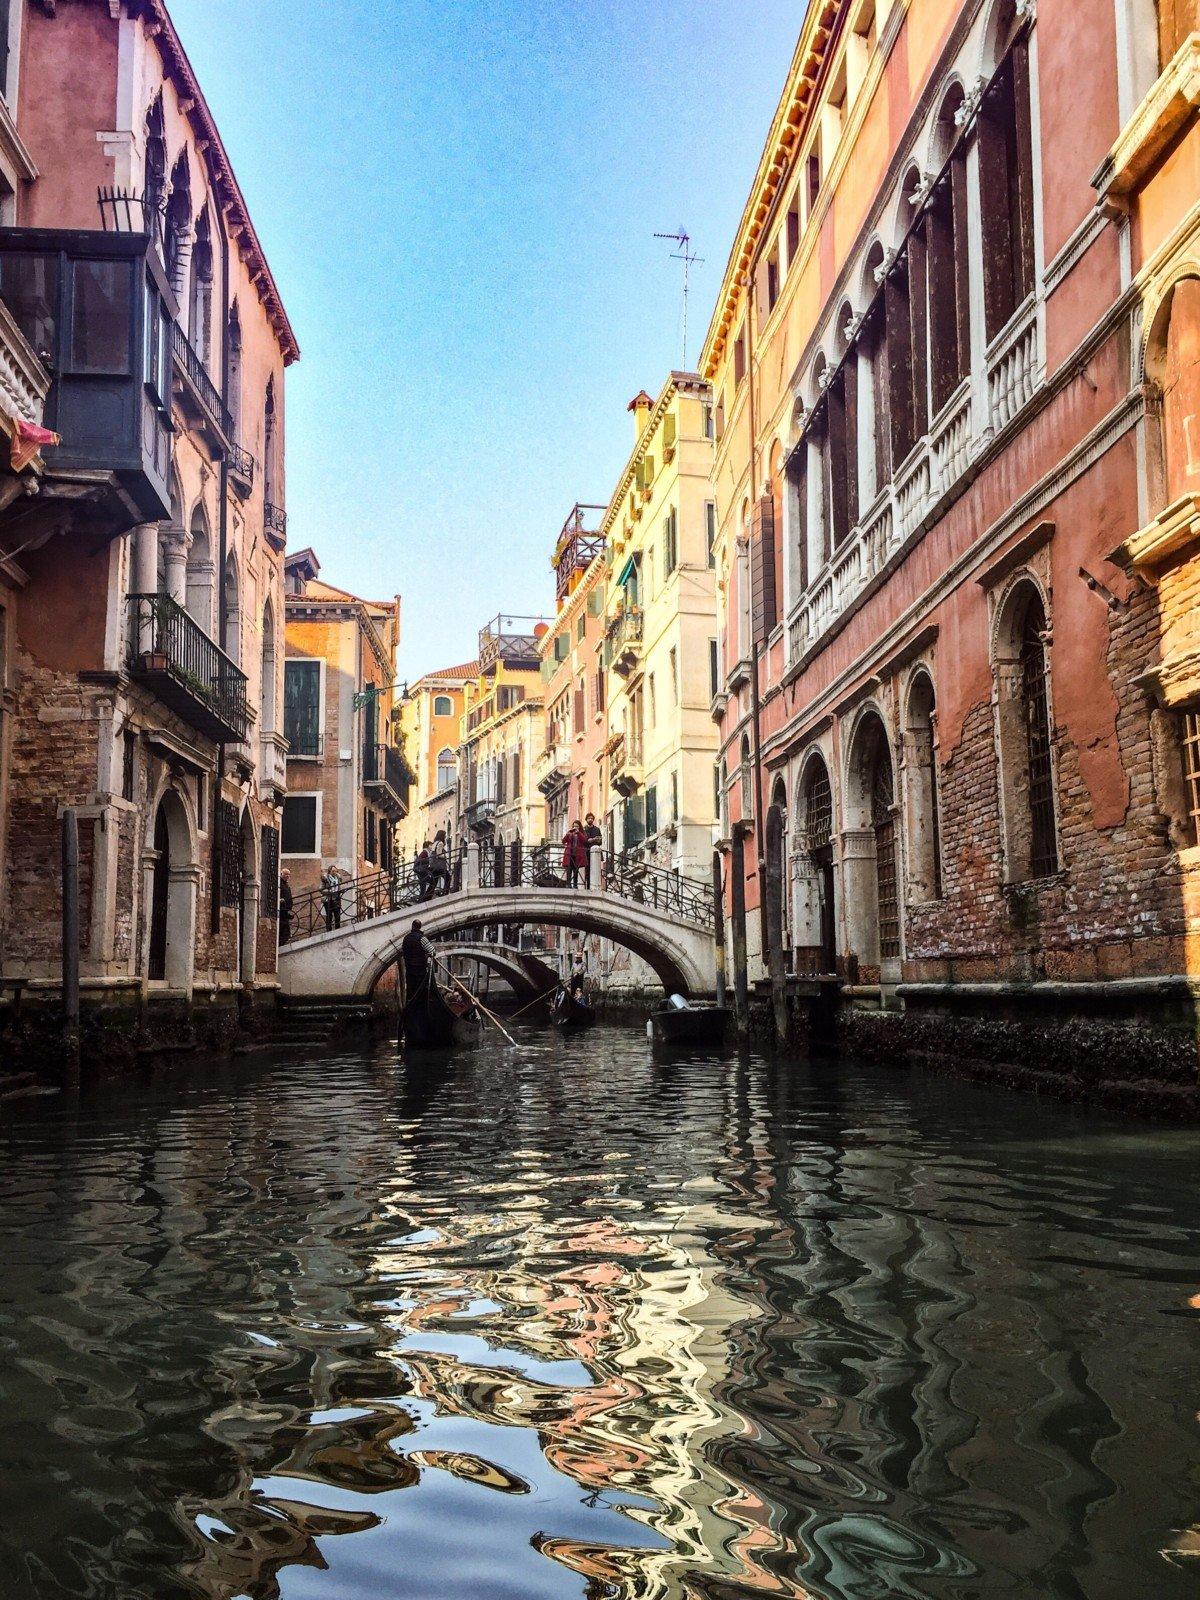 A Venice river cruise